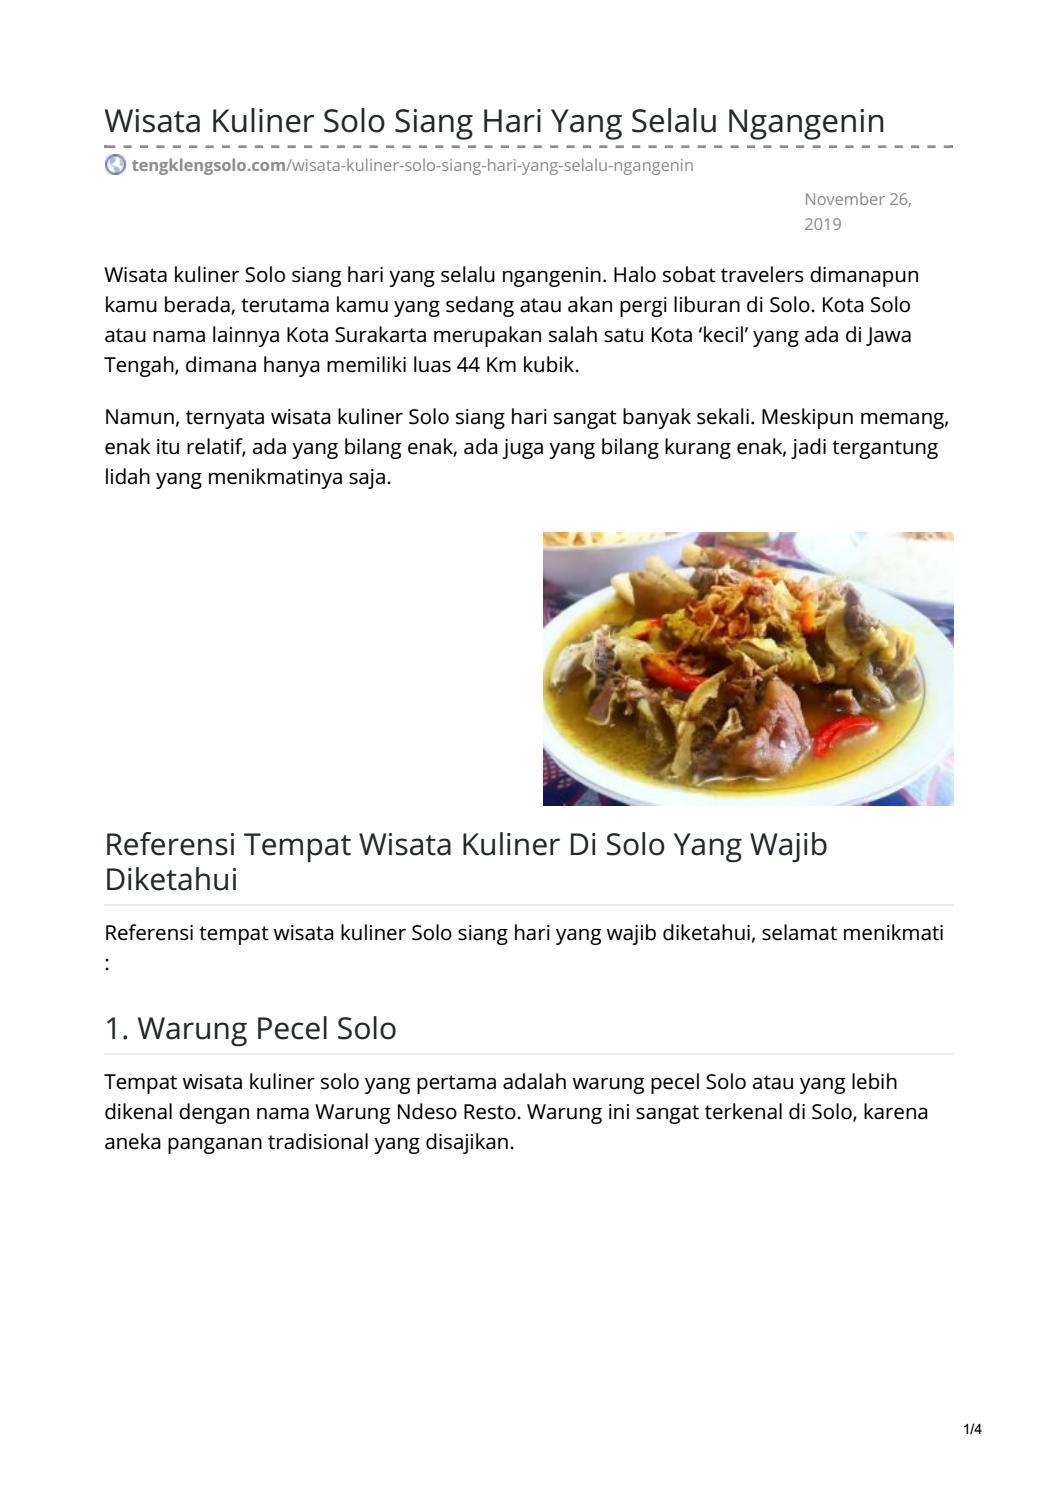 Wisata Kuliner Solo Siang Hari Yang Selalu Ngangenin By